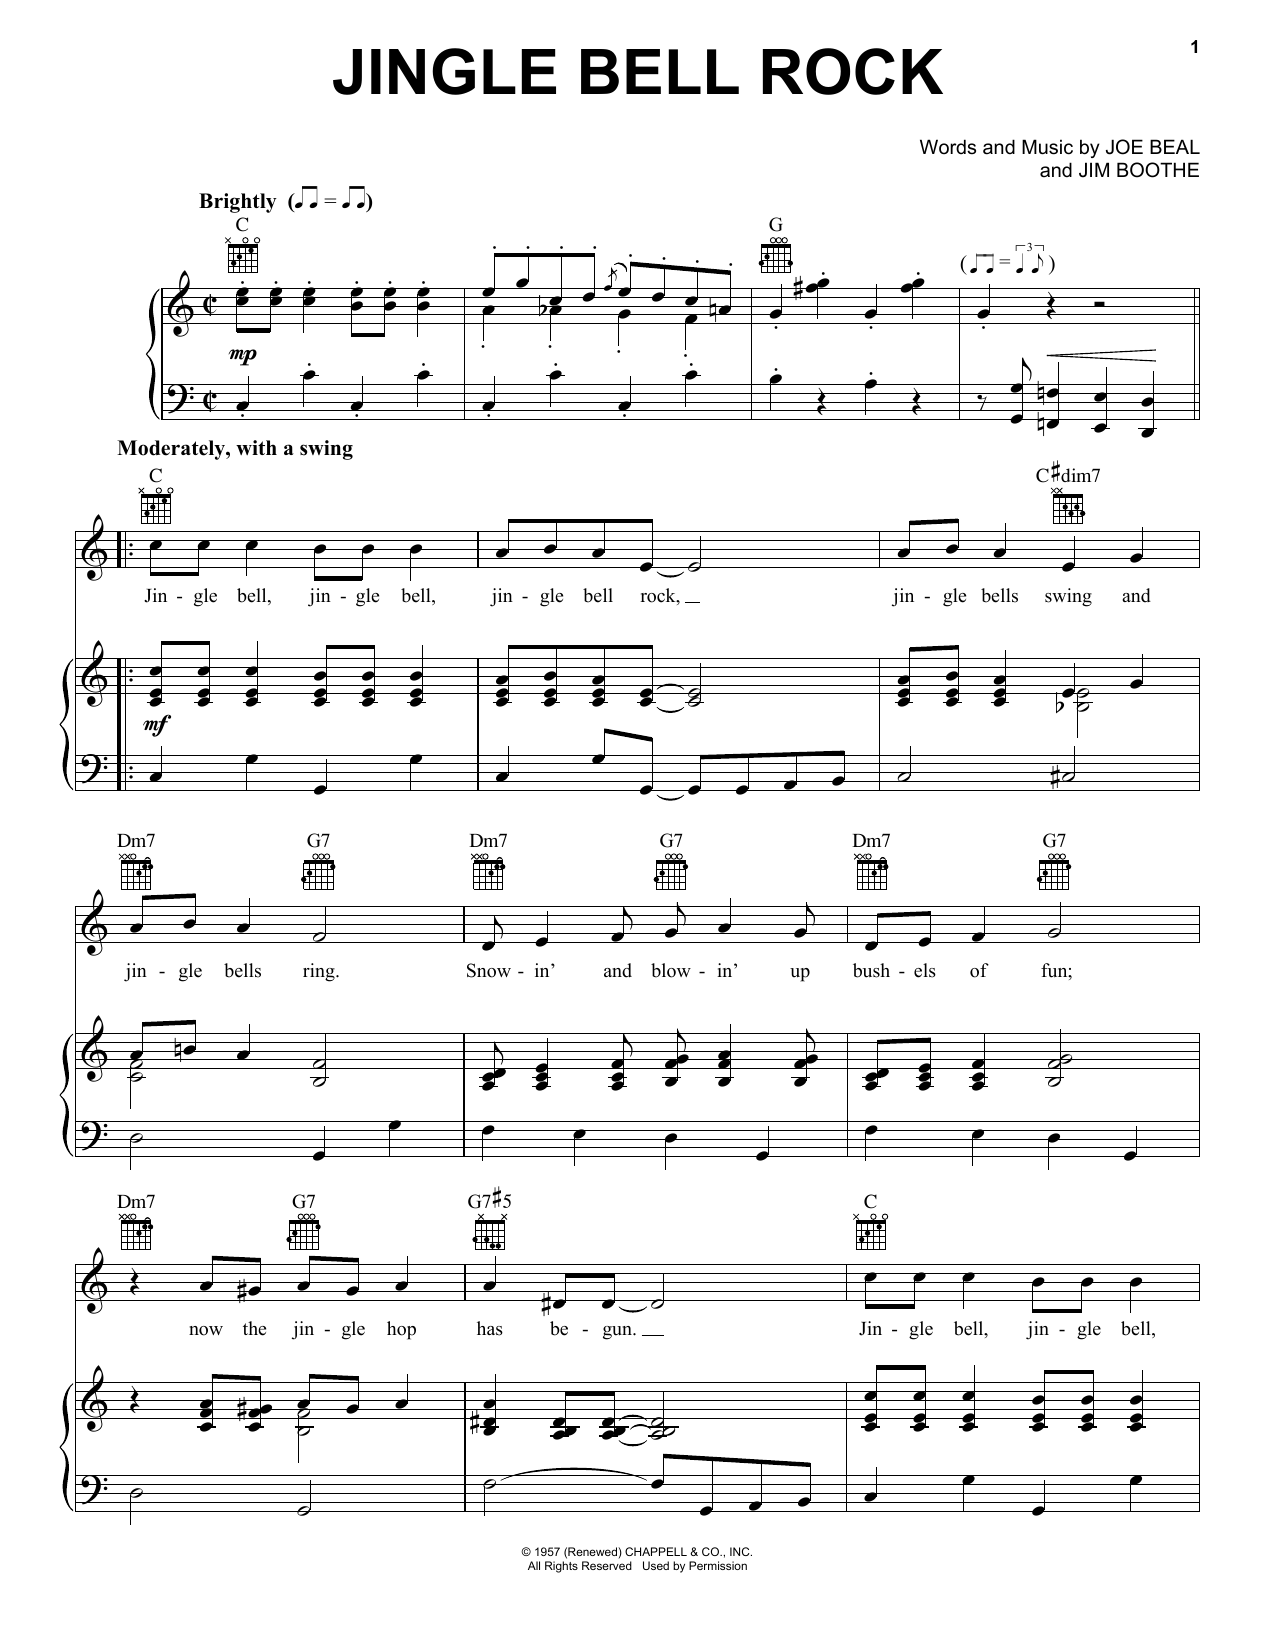 Jingle-Bell Rock sheet music